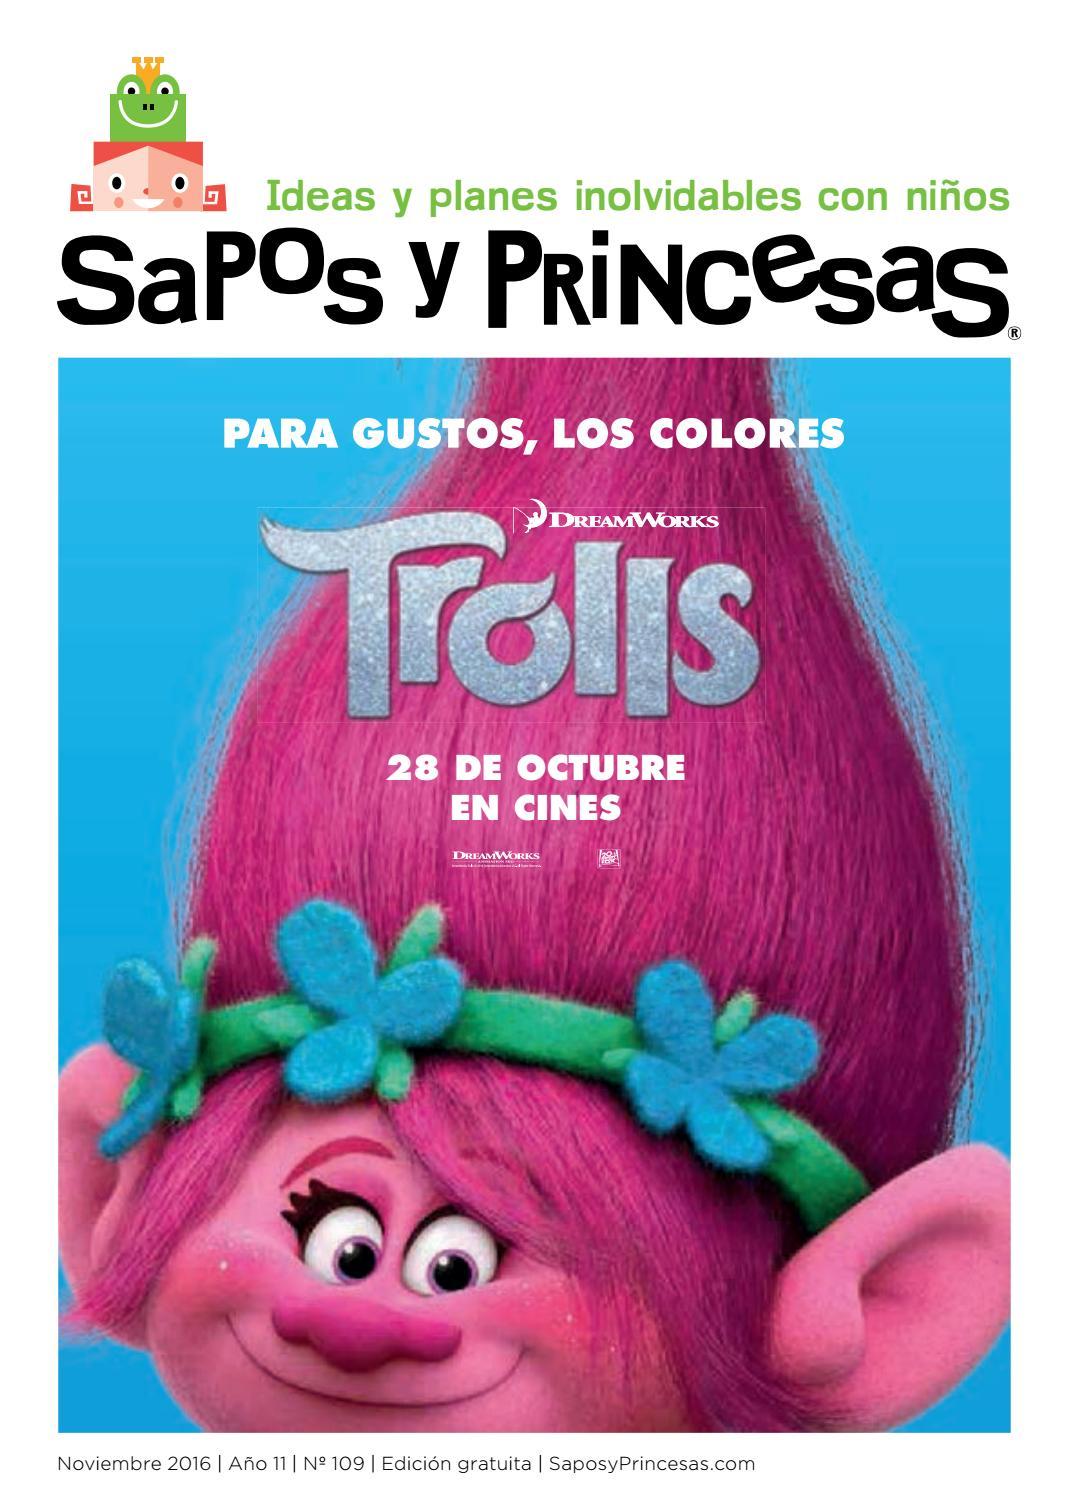 109 Sapos y Princesas Noviembre 2016 by SAPOS Y PRINCESAS - issuu